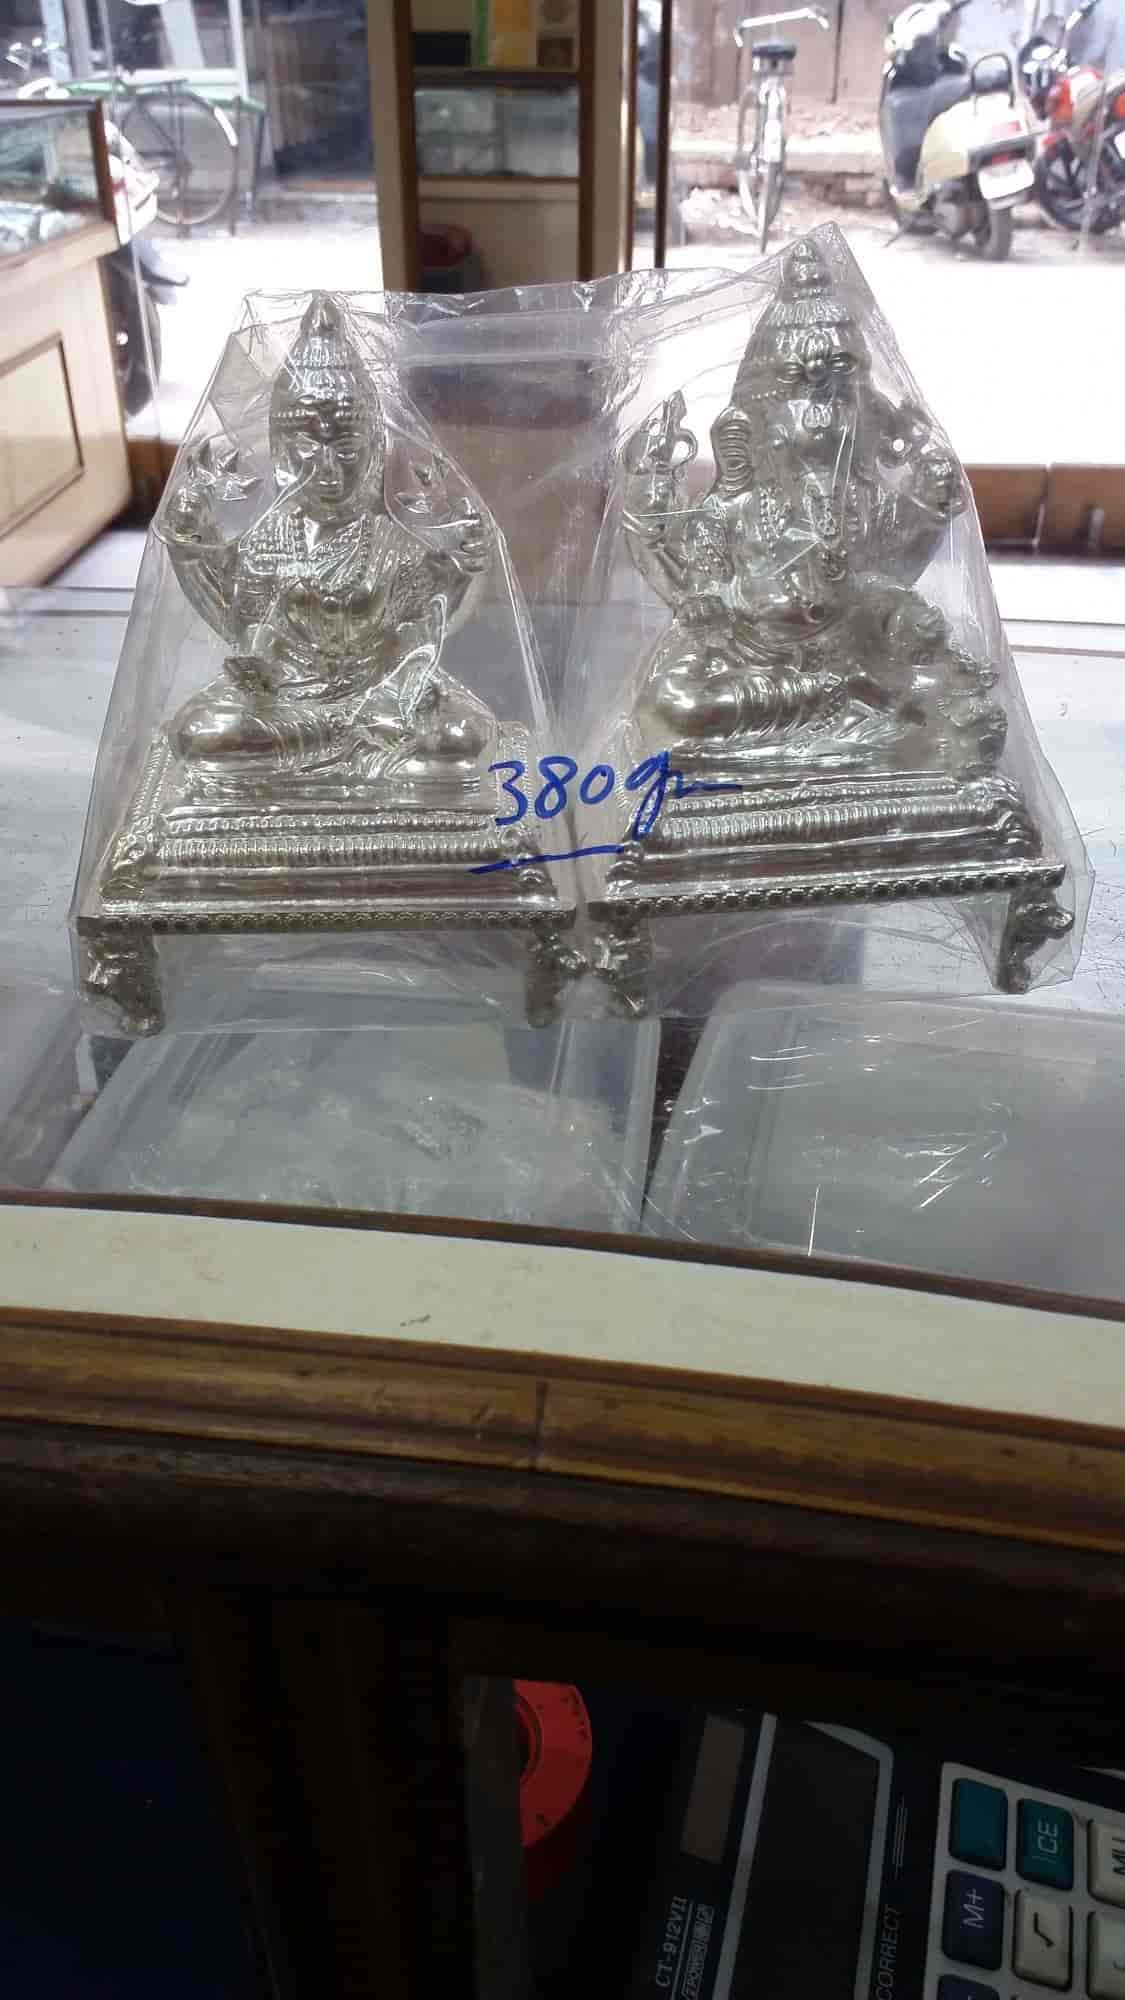 Chandi Hi Chandi Jewellers Photos, Patiala Ho, Patiala- Pictures